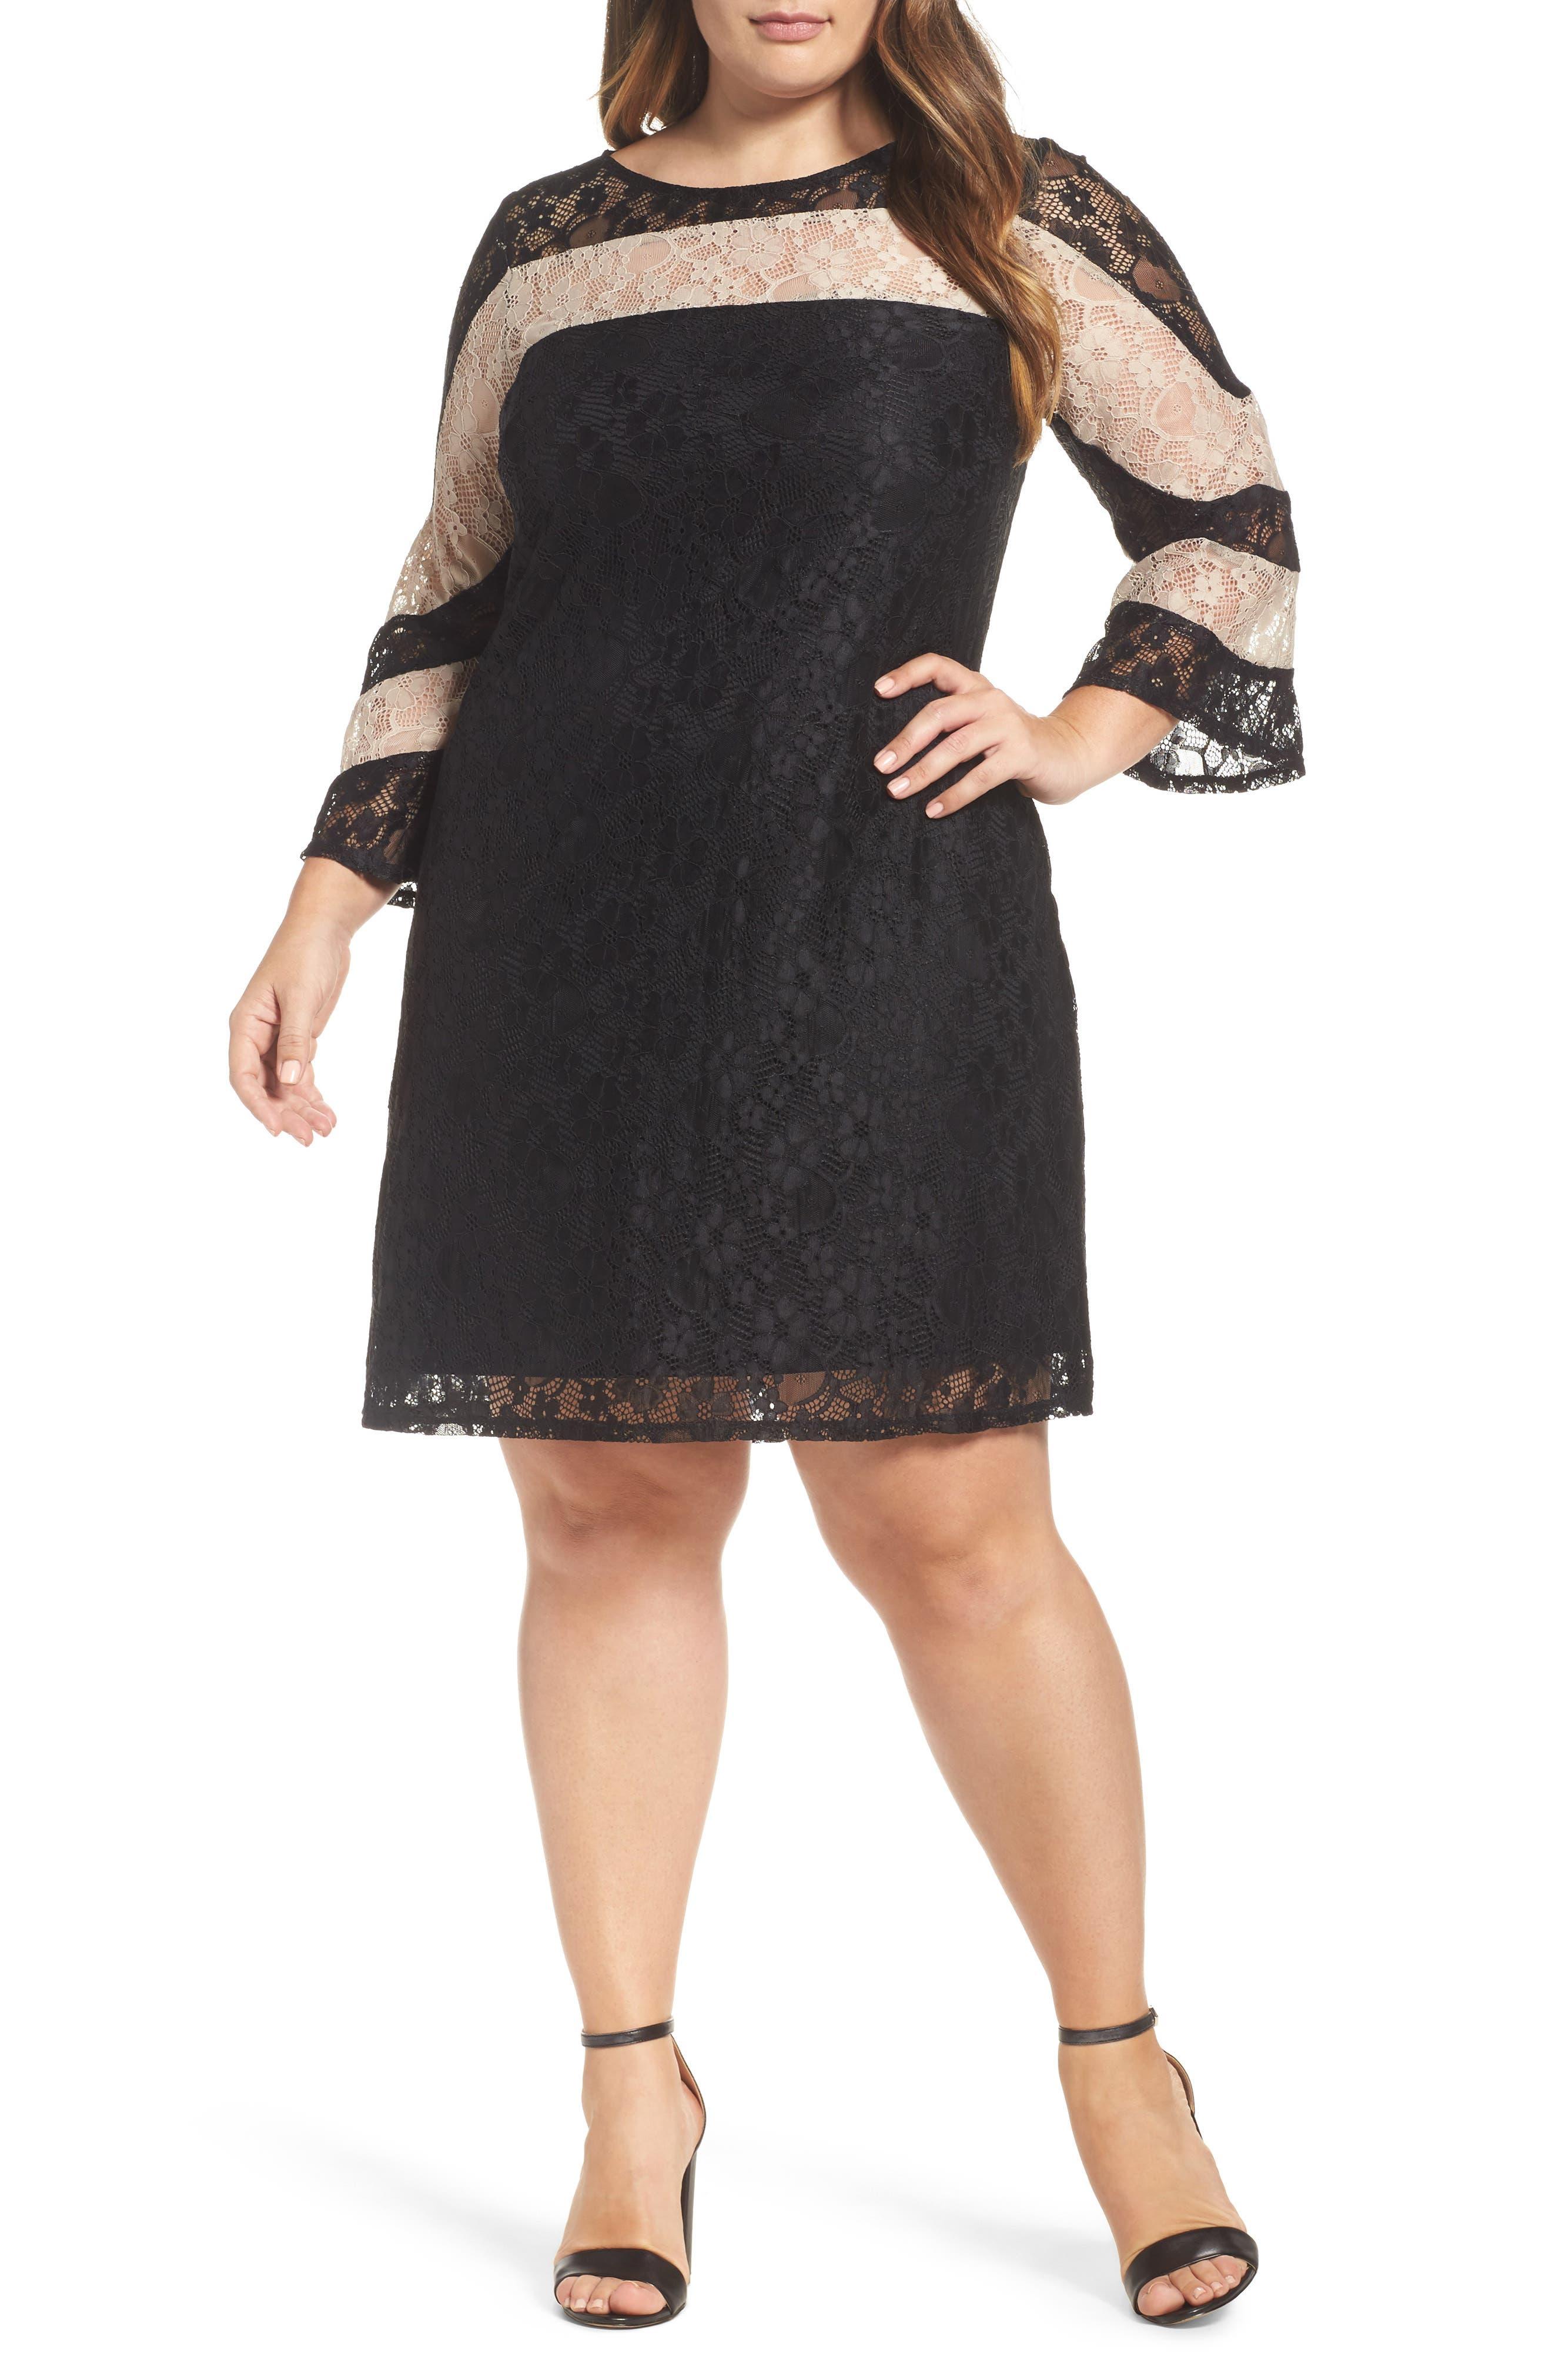 GABBY SKYE Stripe Colorblock Lace Dress